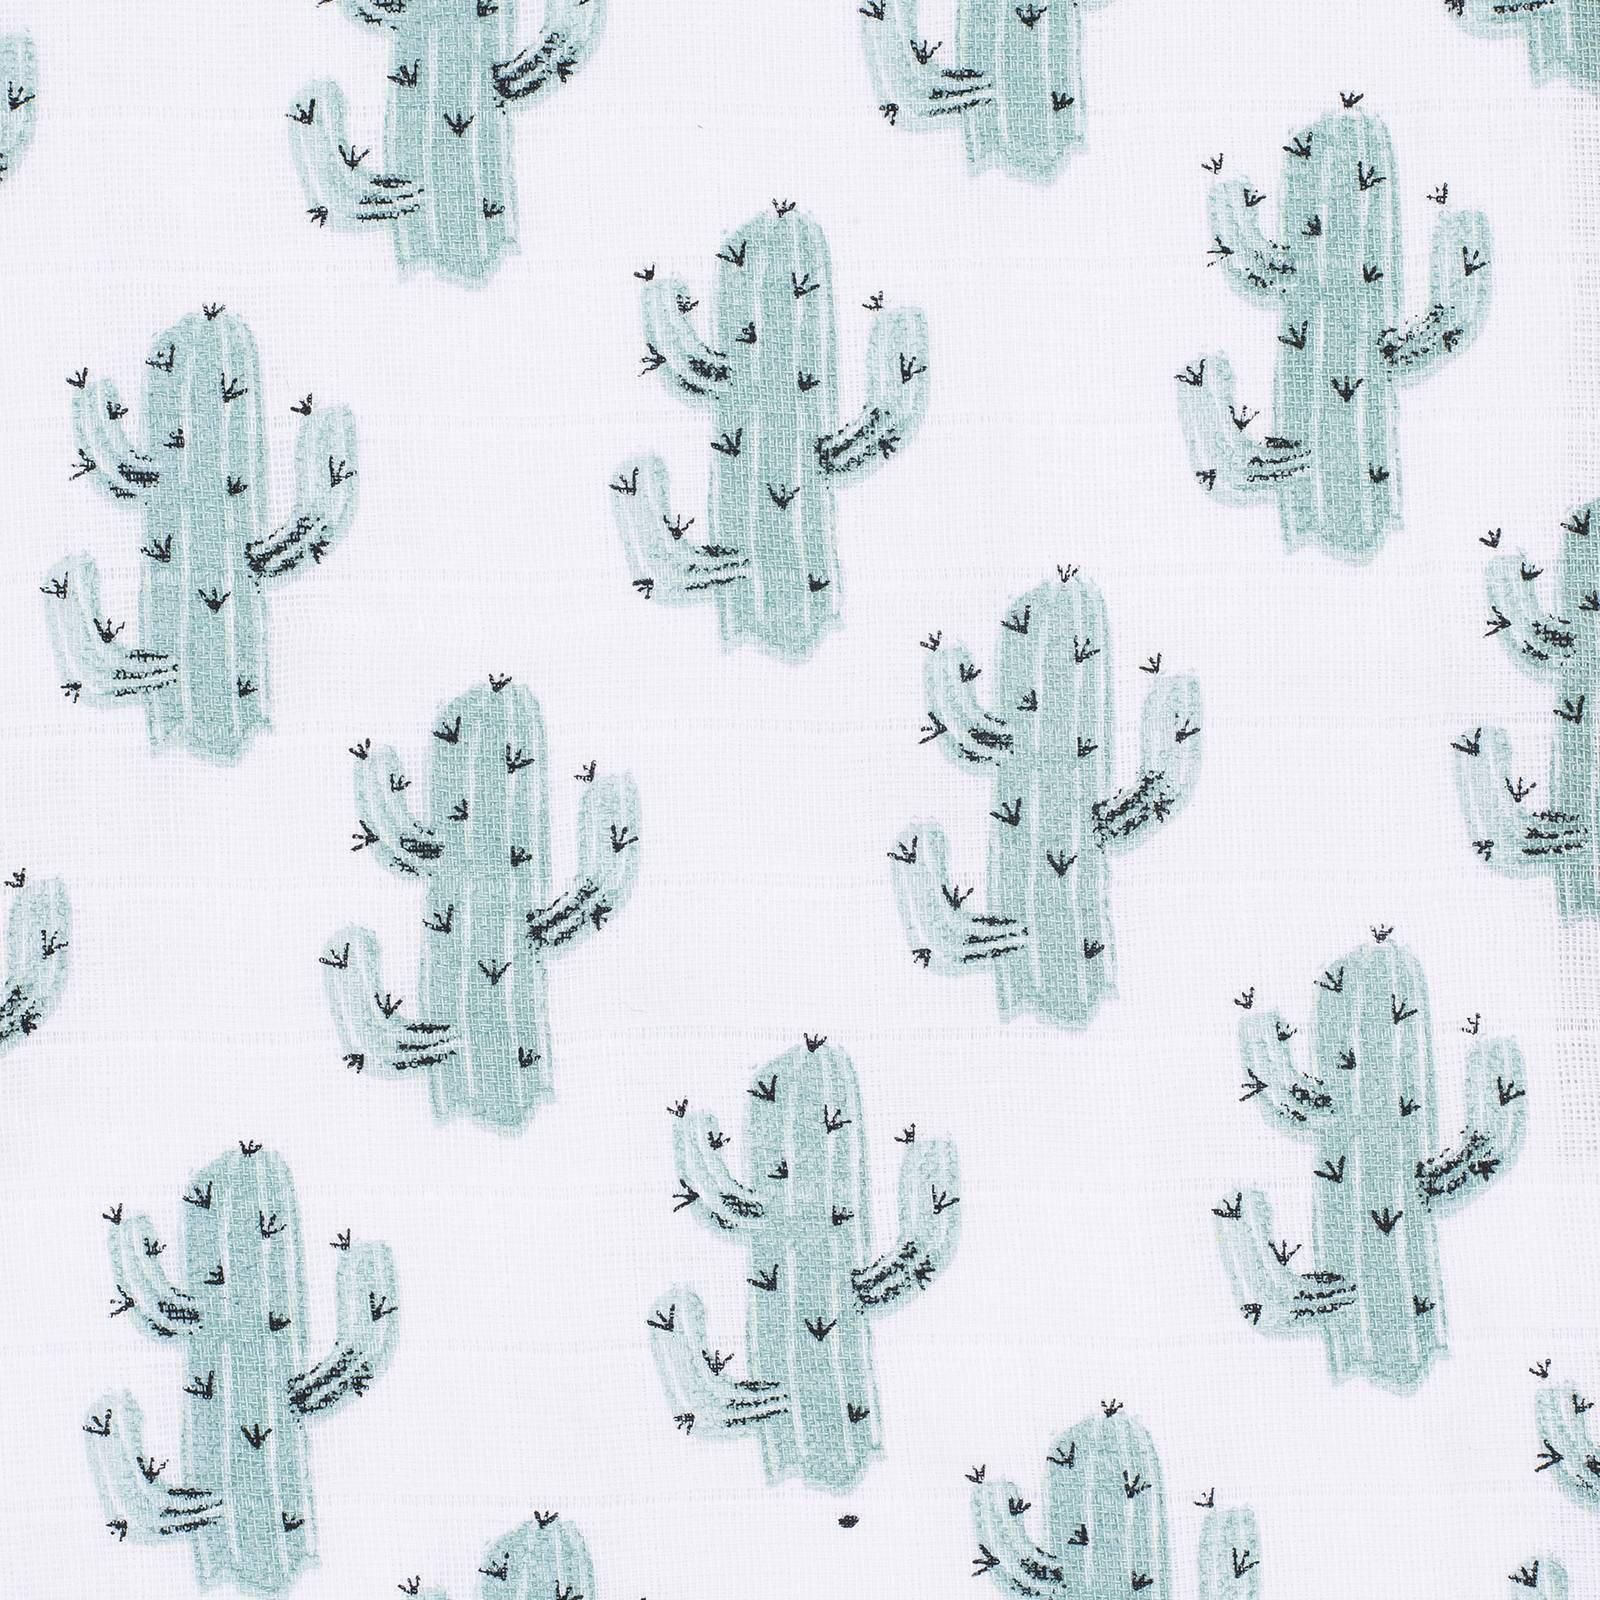 b6e1c45500f Jollein Cactus hydrofiel luier 115x115 cm (2 stuks) | wehkamp